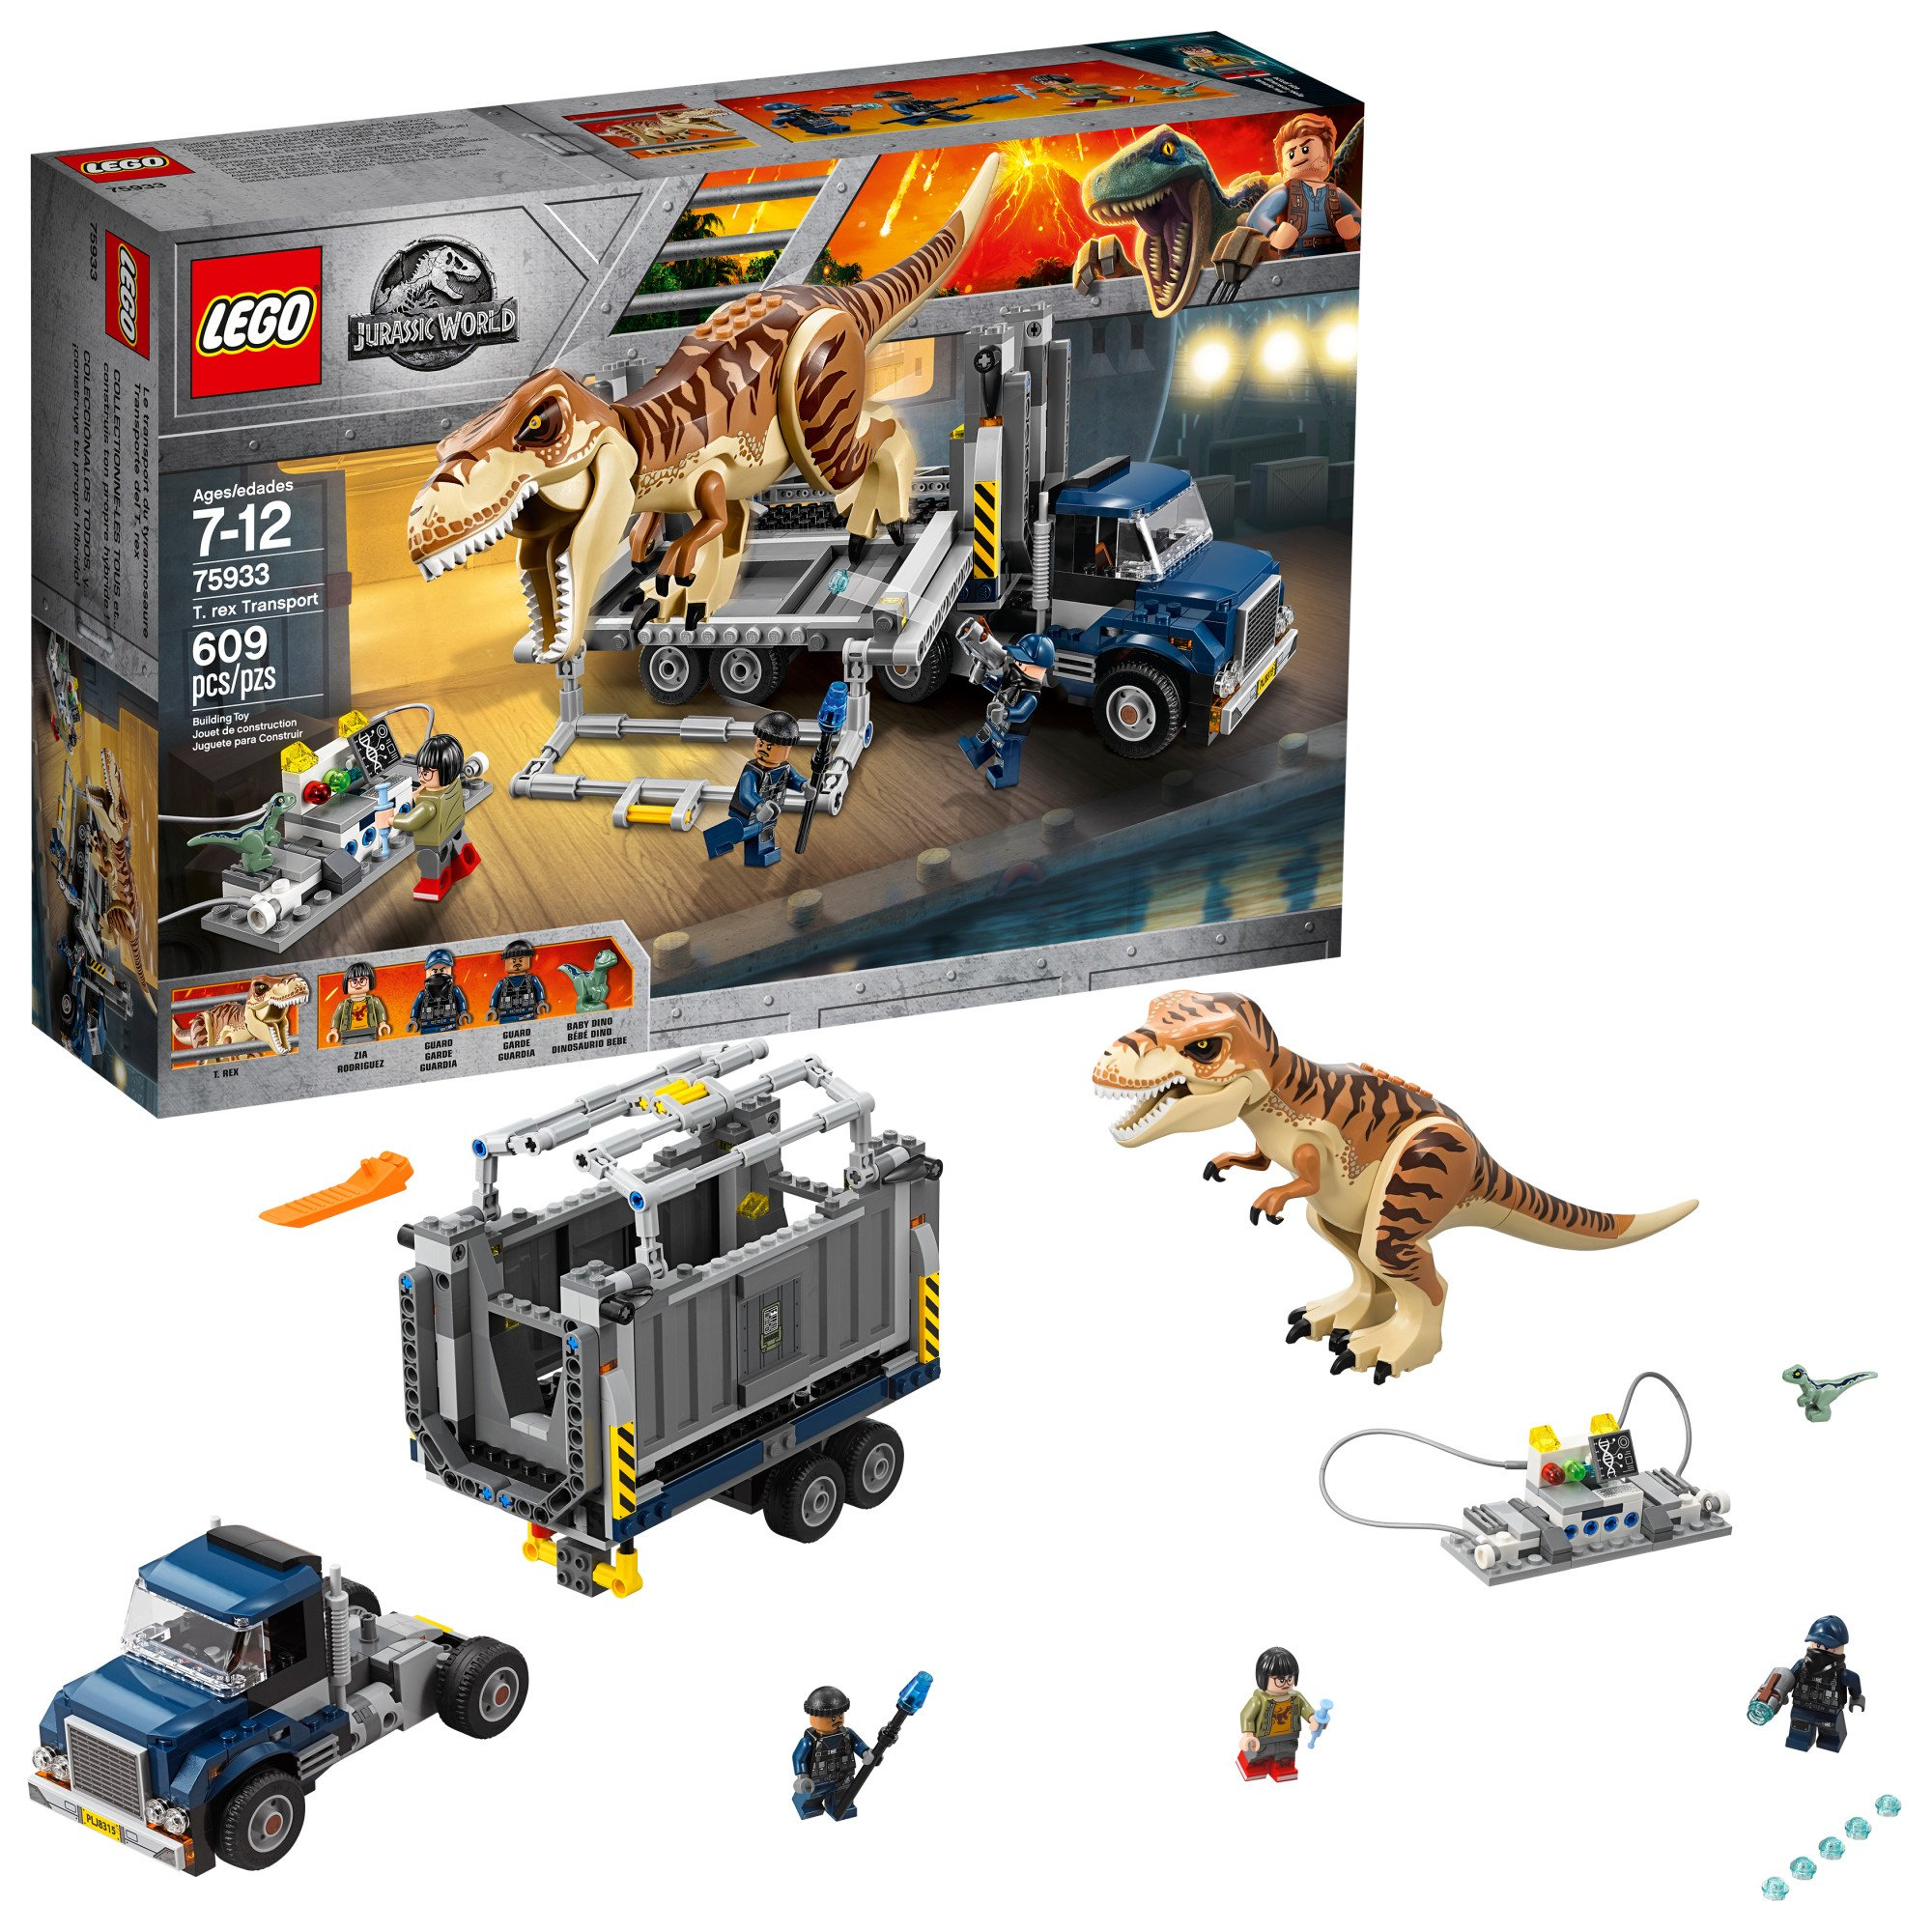 LEGO Jurassic World T. Rex Transport 75933 Building Kit (609 Piece), Multi